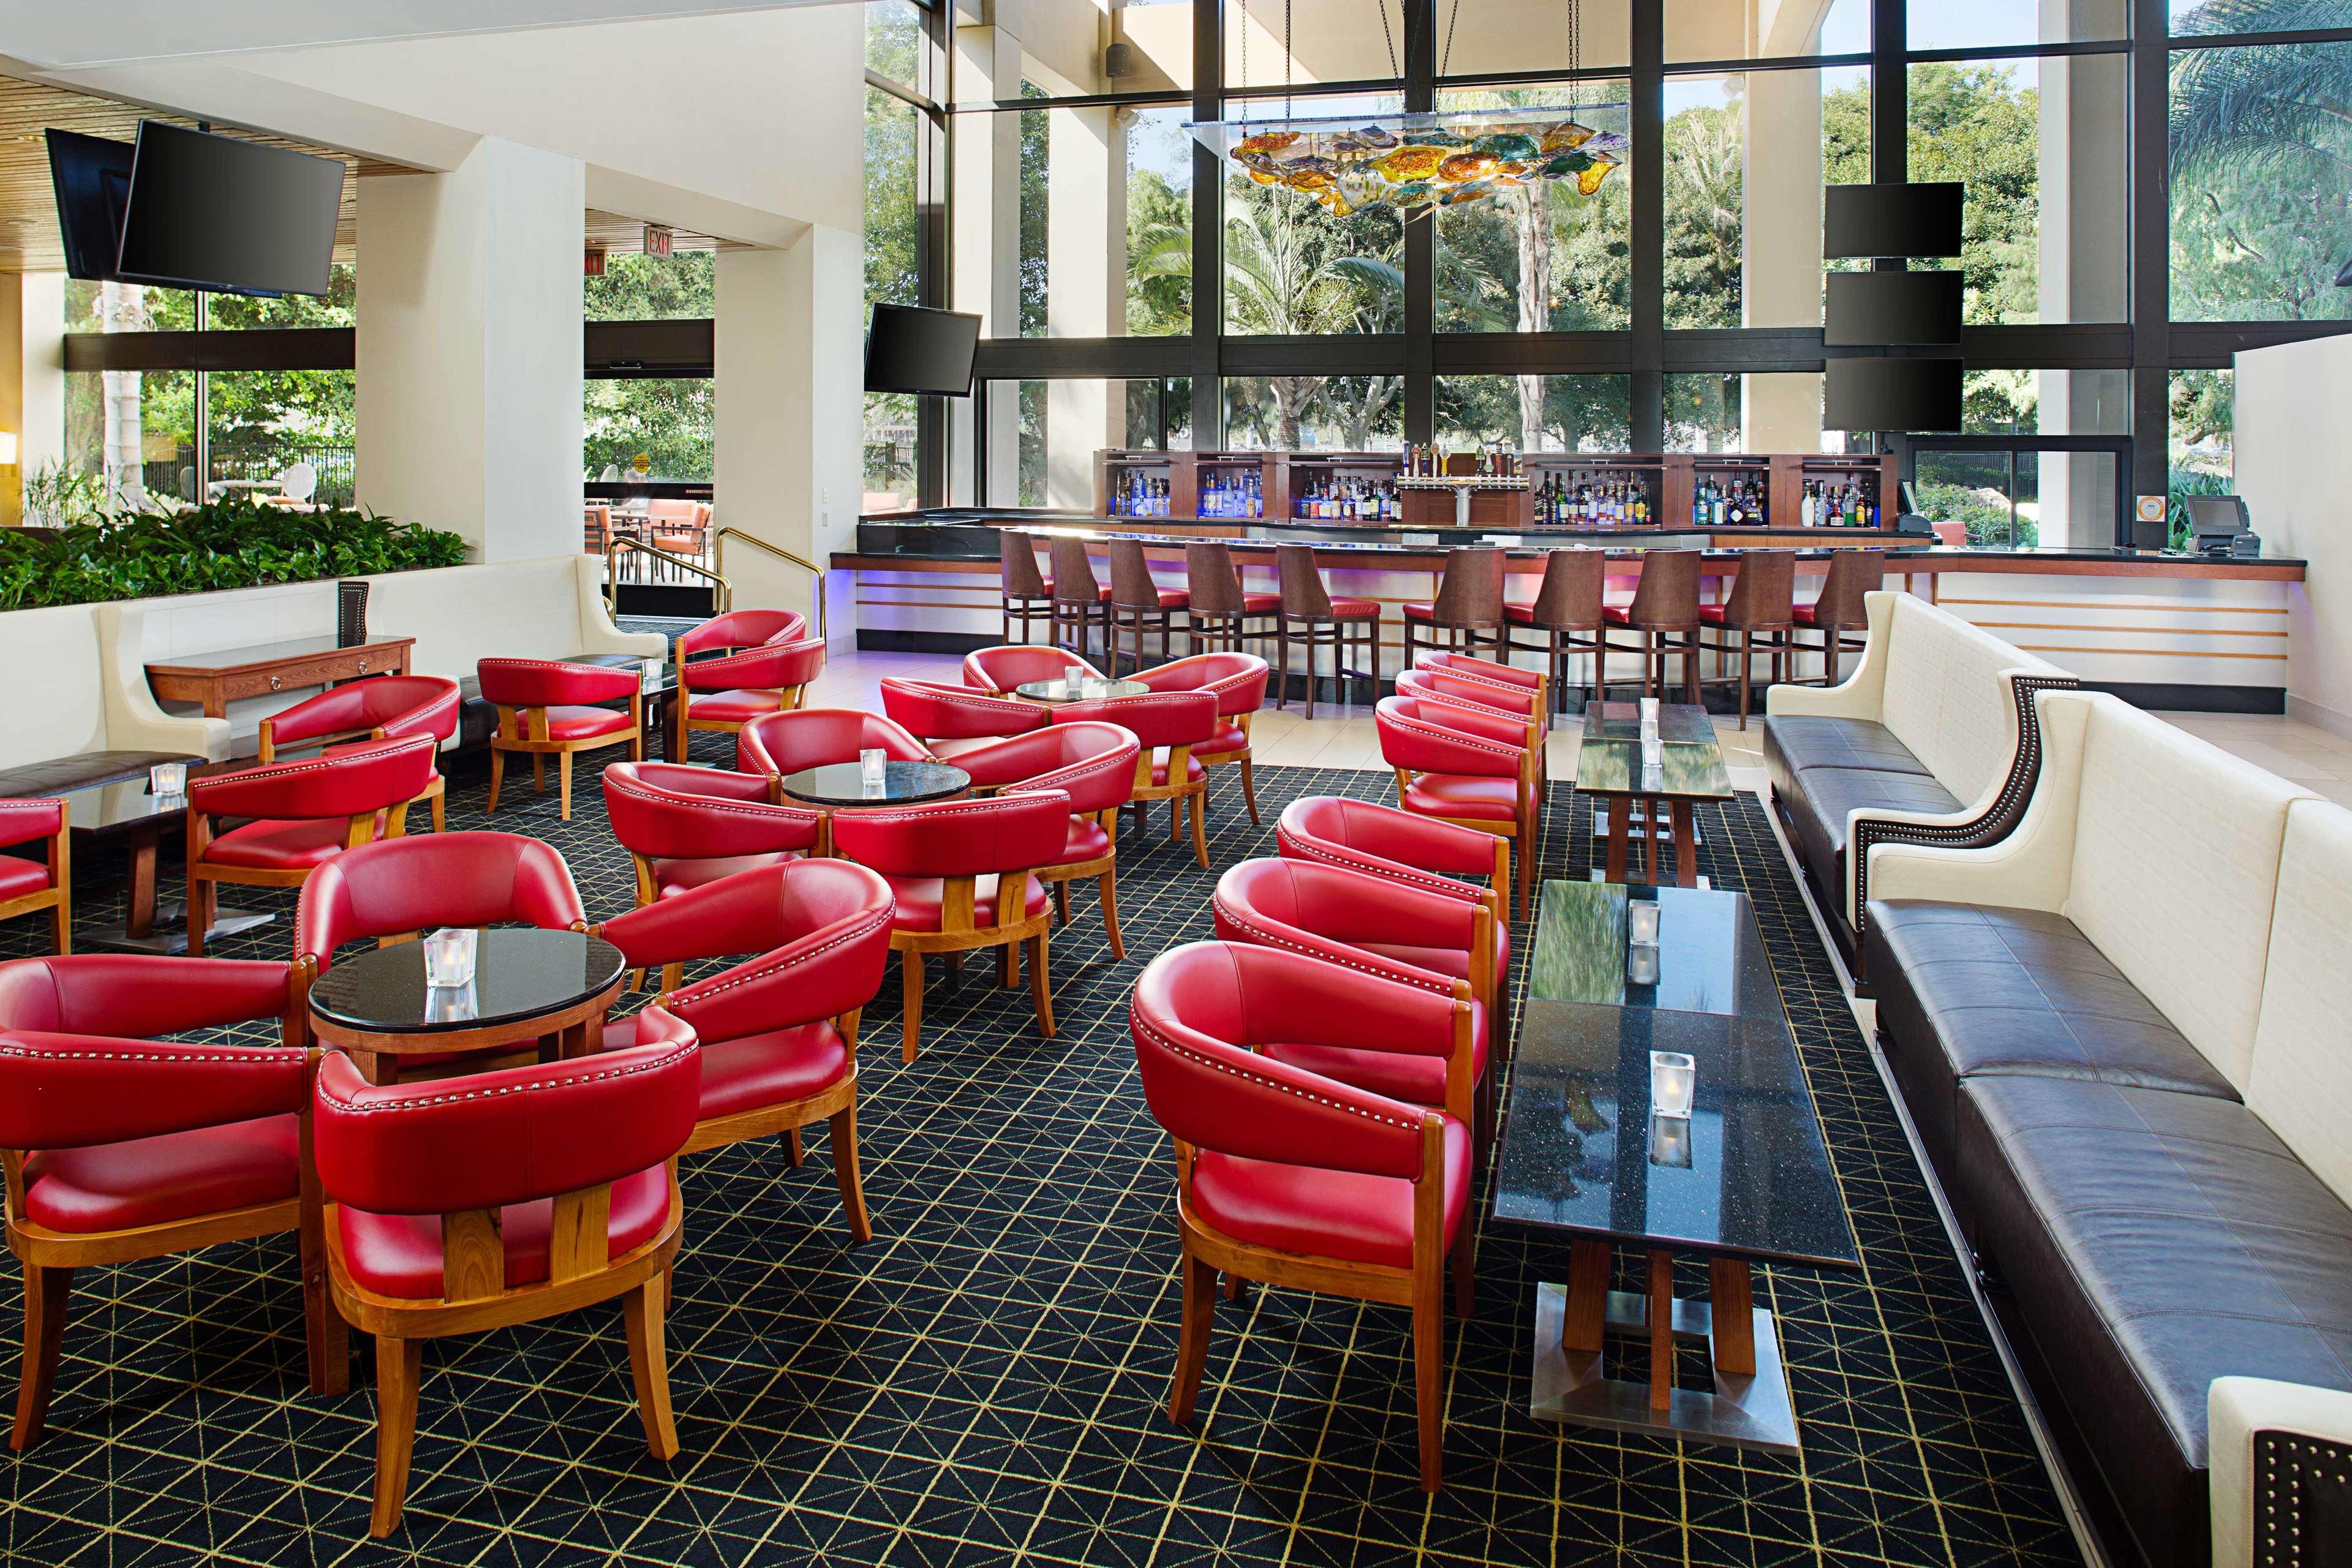 DoubleTree by Hilton Hotel Anaheim - Orange County image 23